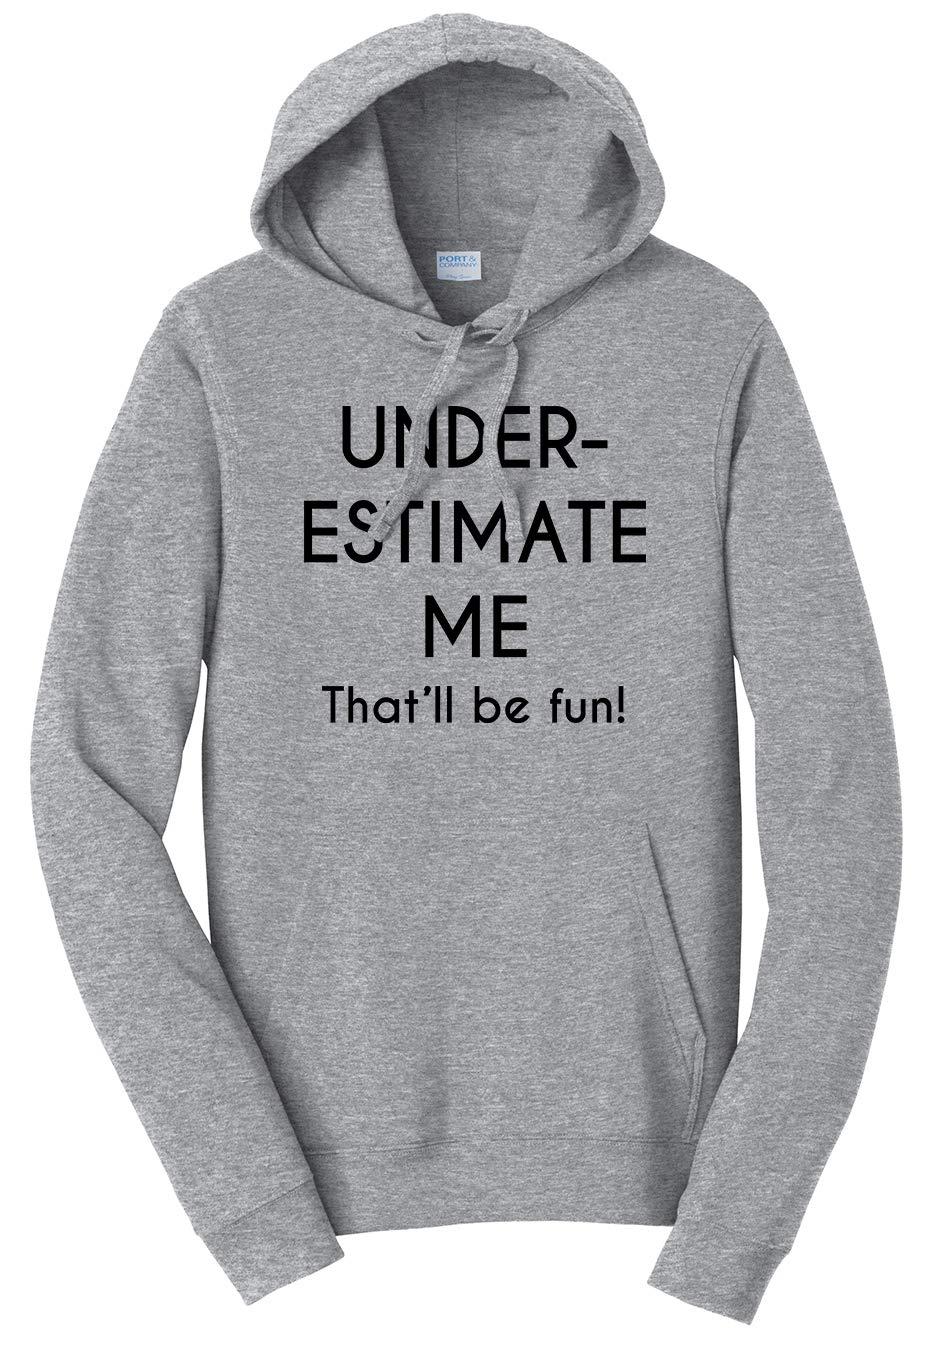 Unisex Underestimate Me Thatll Be Fun Shirts